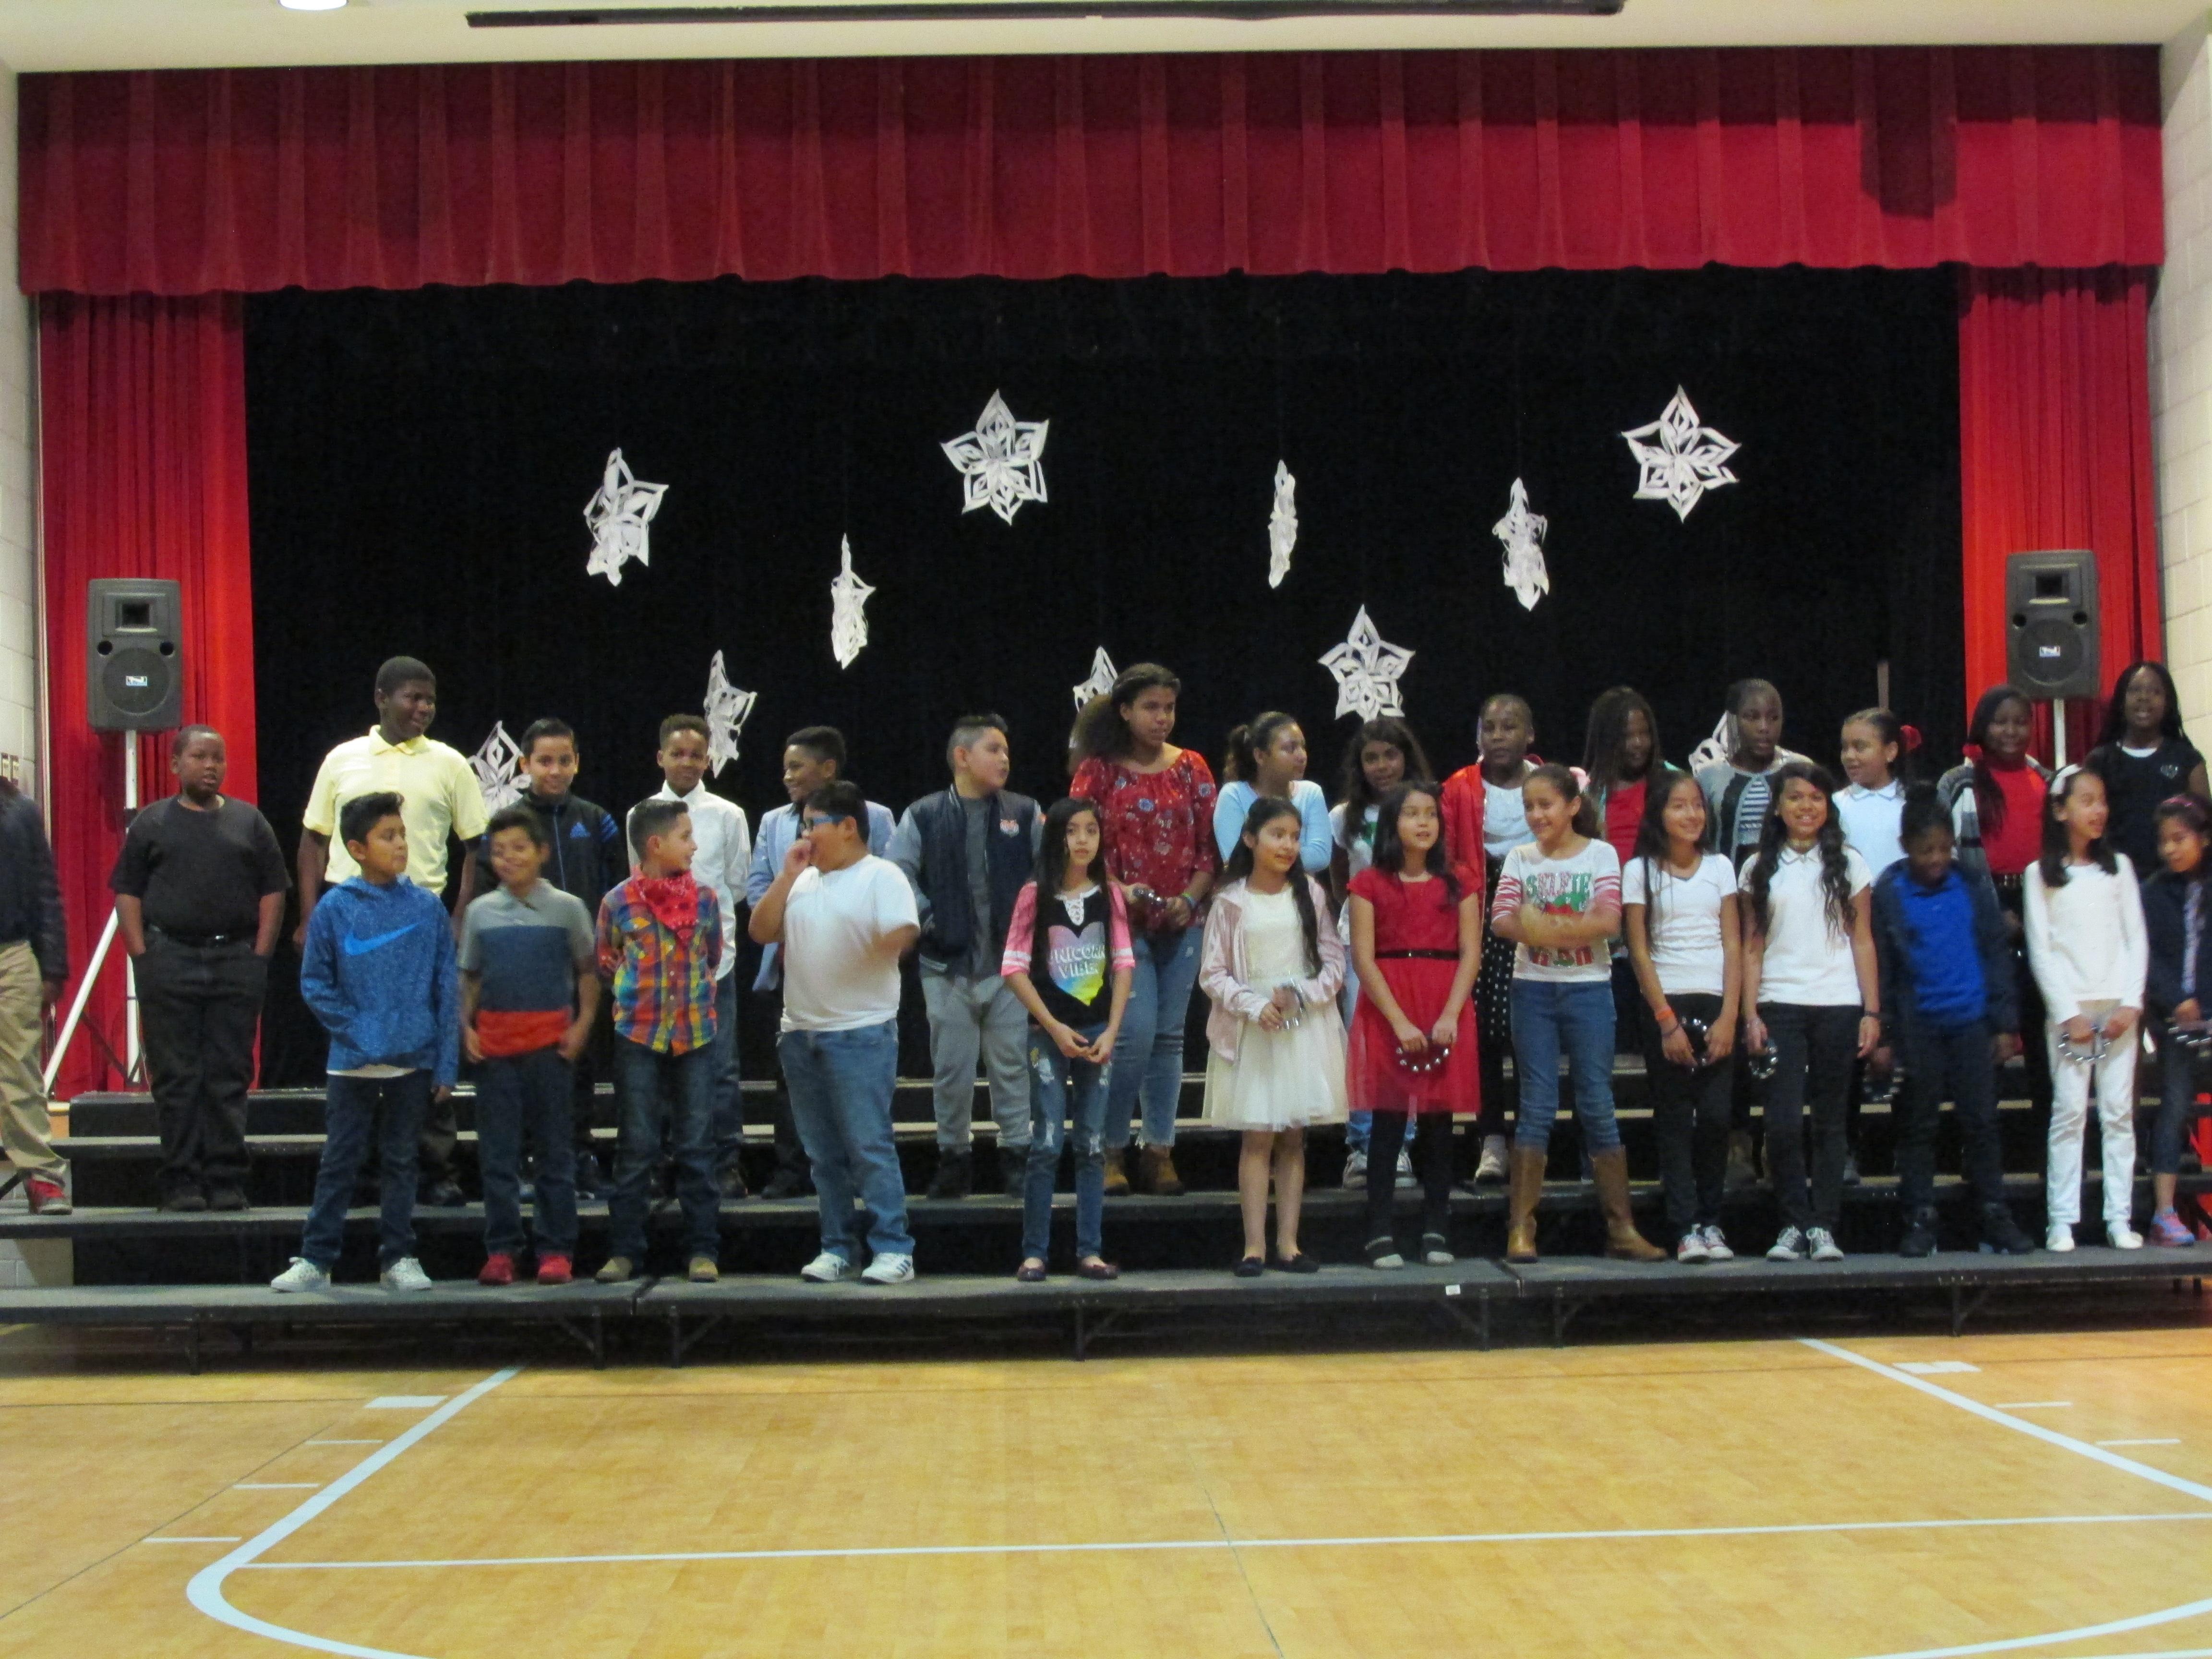 Ridgeland Elementary School